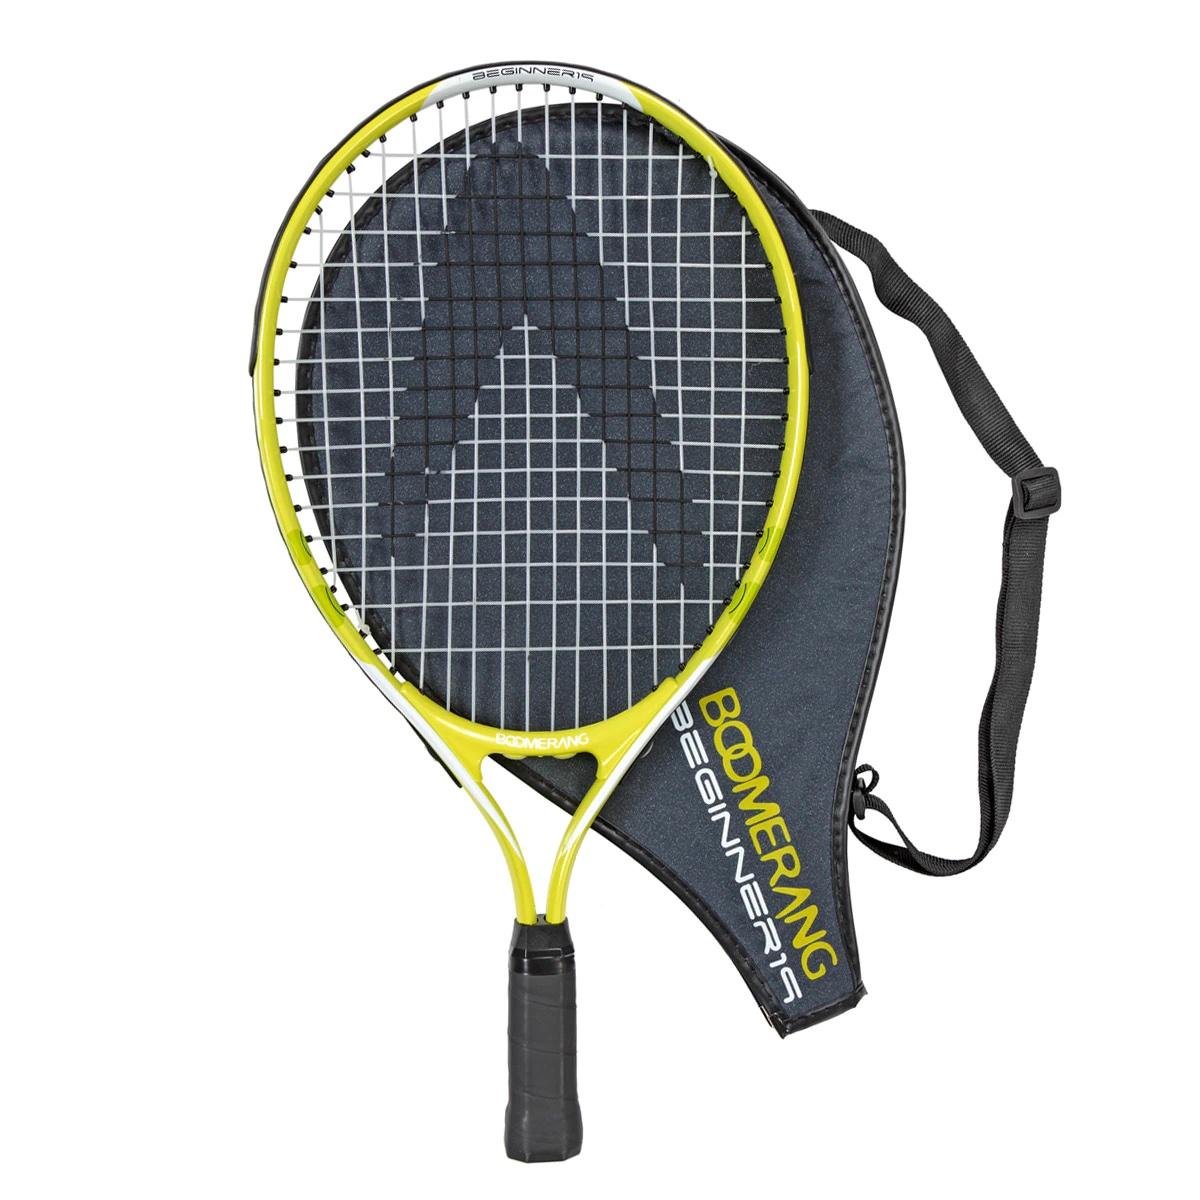 BOOMERANG Raqueta de tenis de niños Begginer 19'' Boomerang